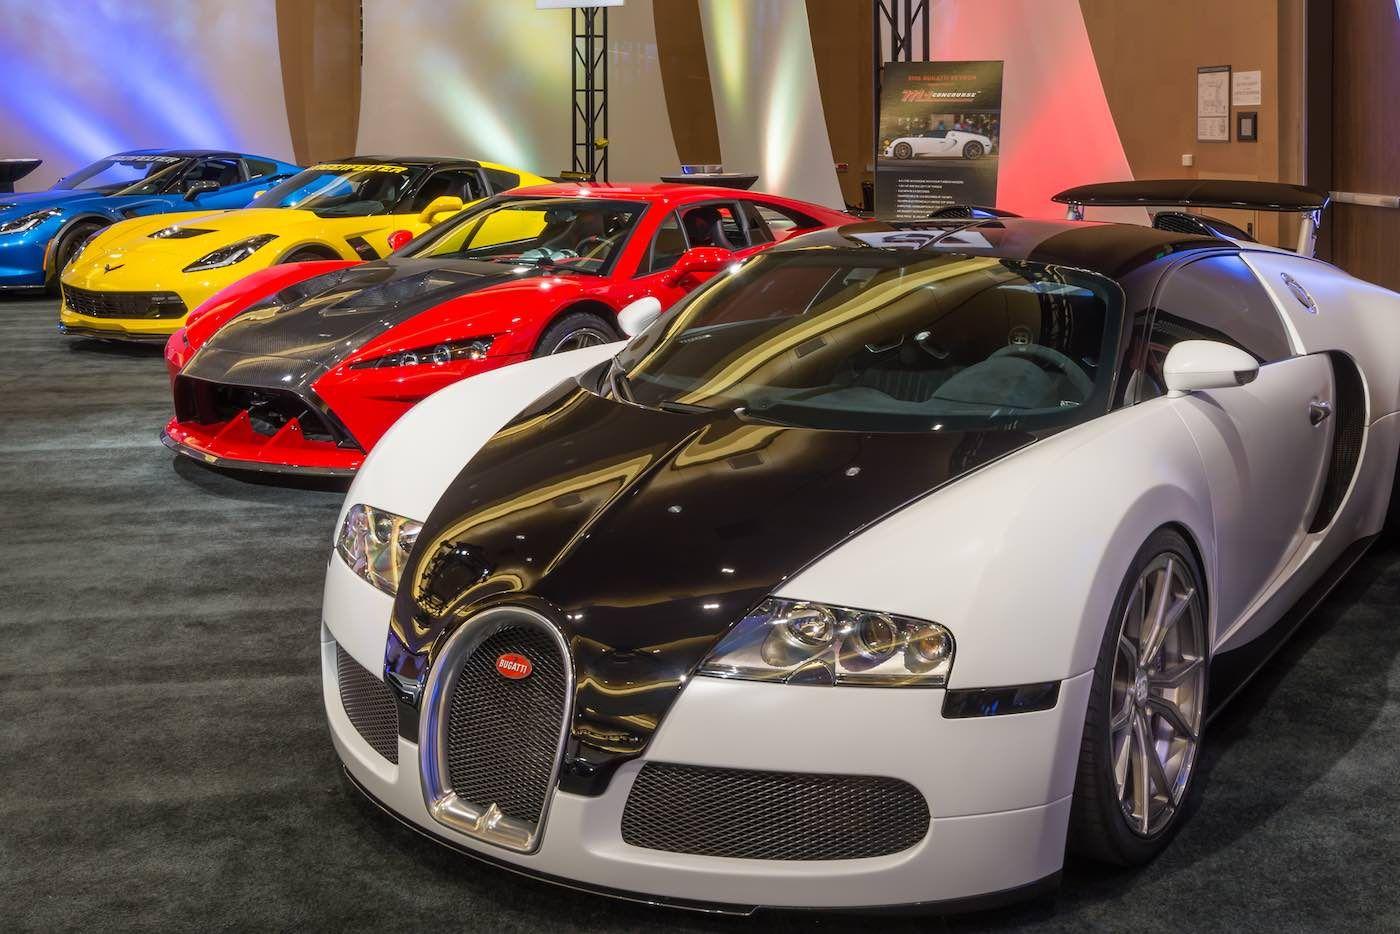 Cuales Son Los Autos Mas Caros Del Mundo In 2020 Bugatti Veyron Flannel Throw Veyron